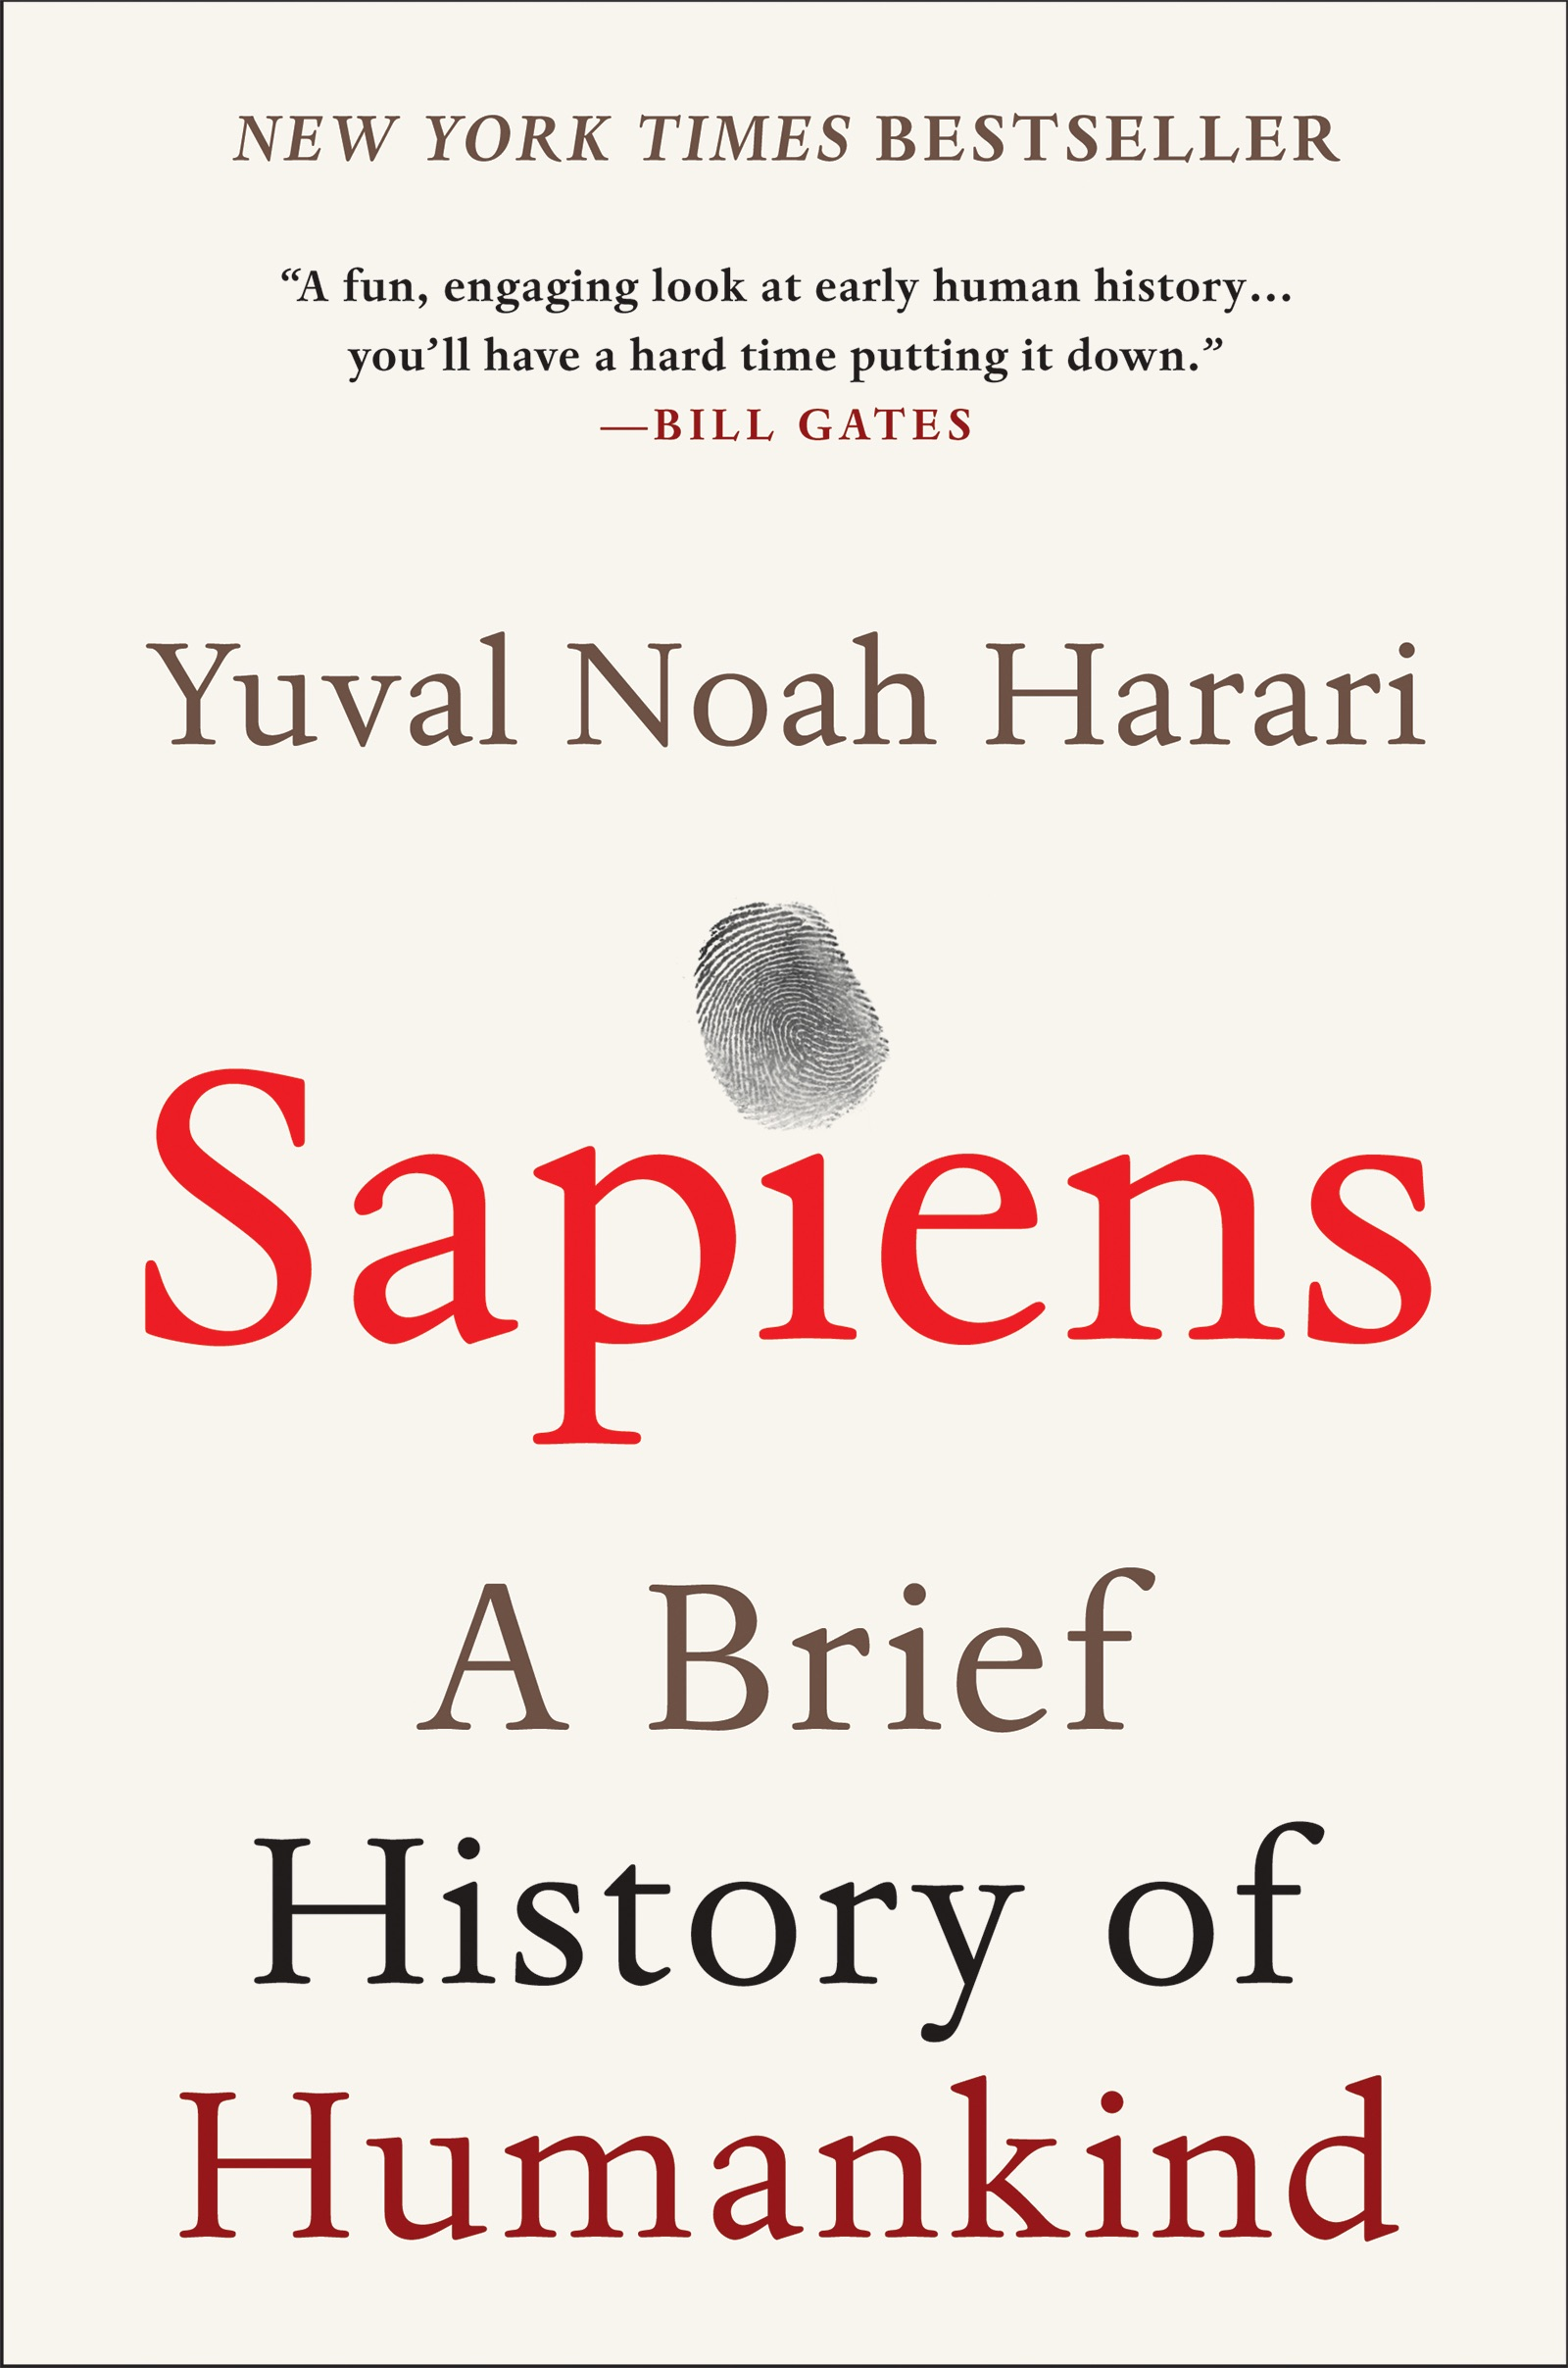 Book Cover of Sapiens